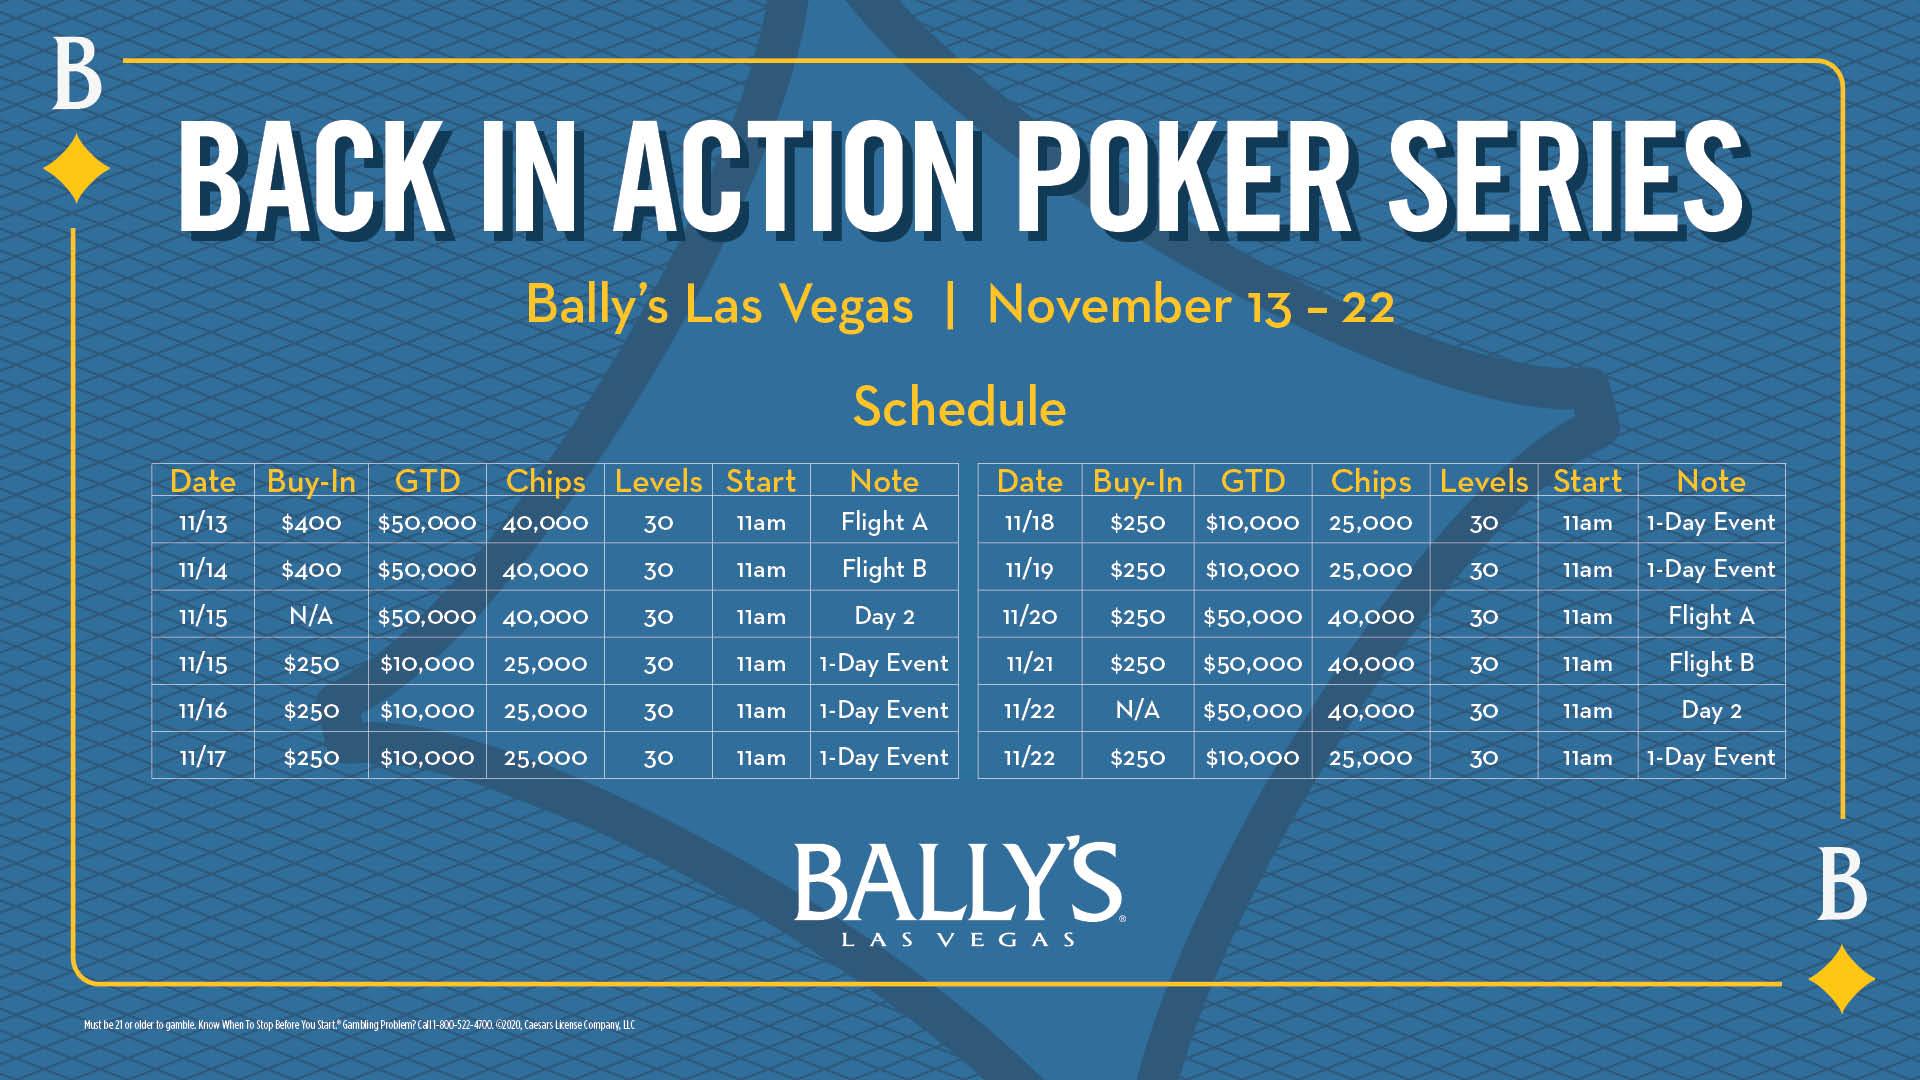 Boulevard casino poker tournament schedule las vegas casinos business